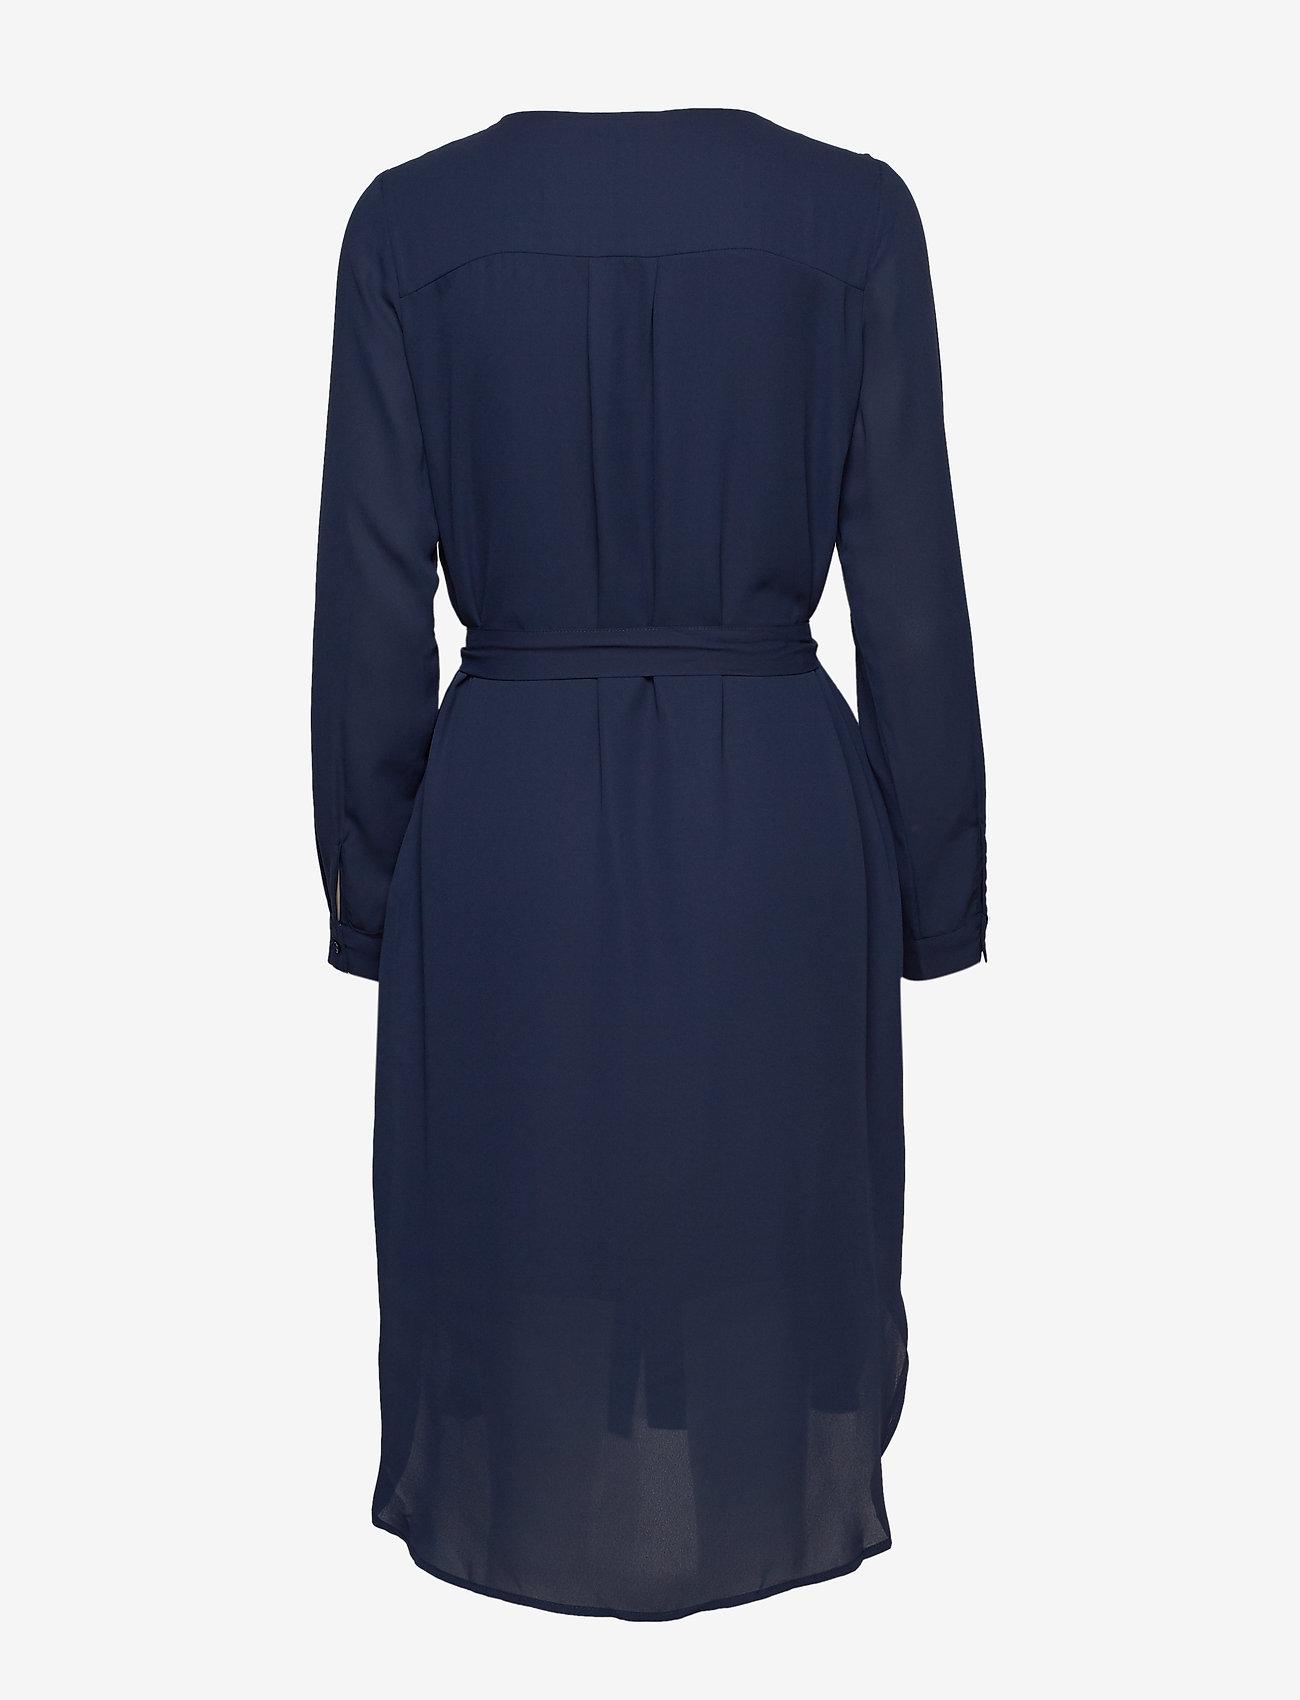 Selected Femme - SLFDYNELLA LS DRESS NOOS - robes midi - dark sapphire - 1